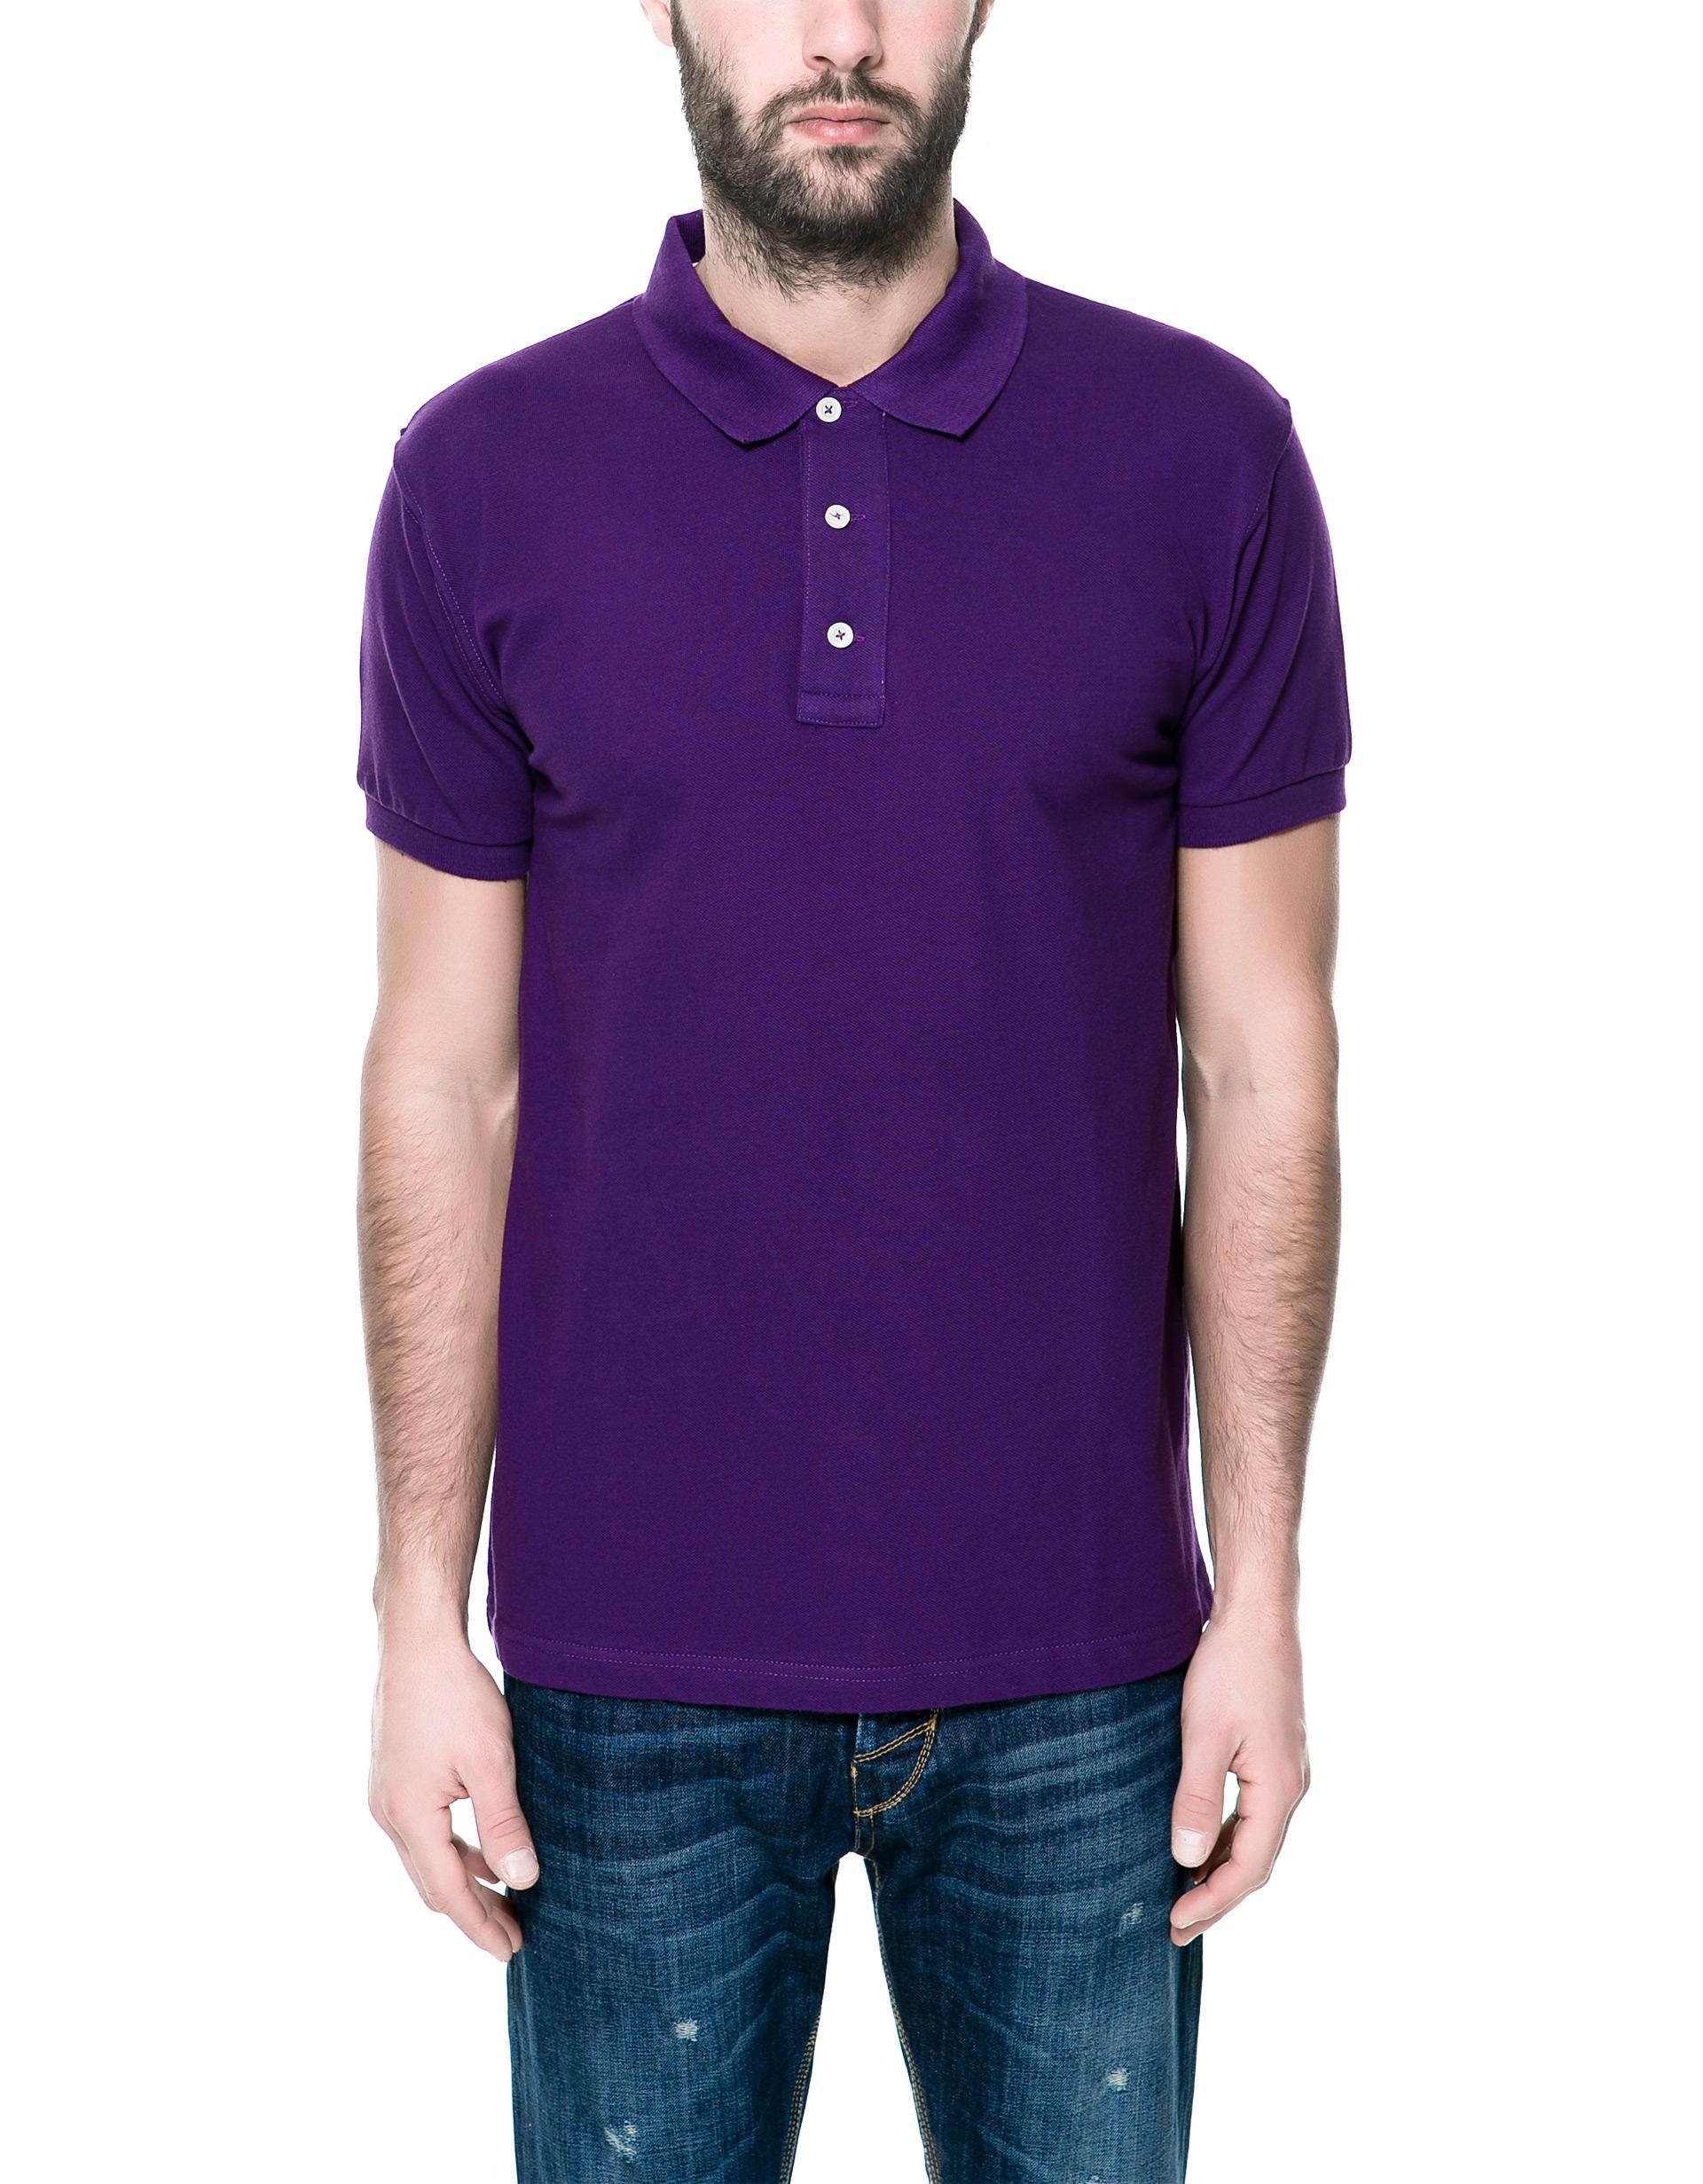 Zara piqu polo shirt in purple for men lyst for Zara mens shirts sale